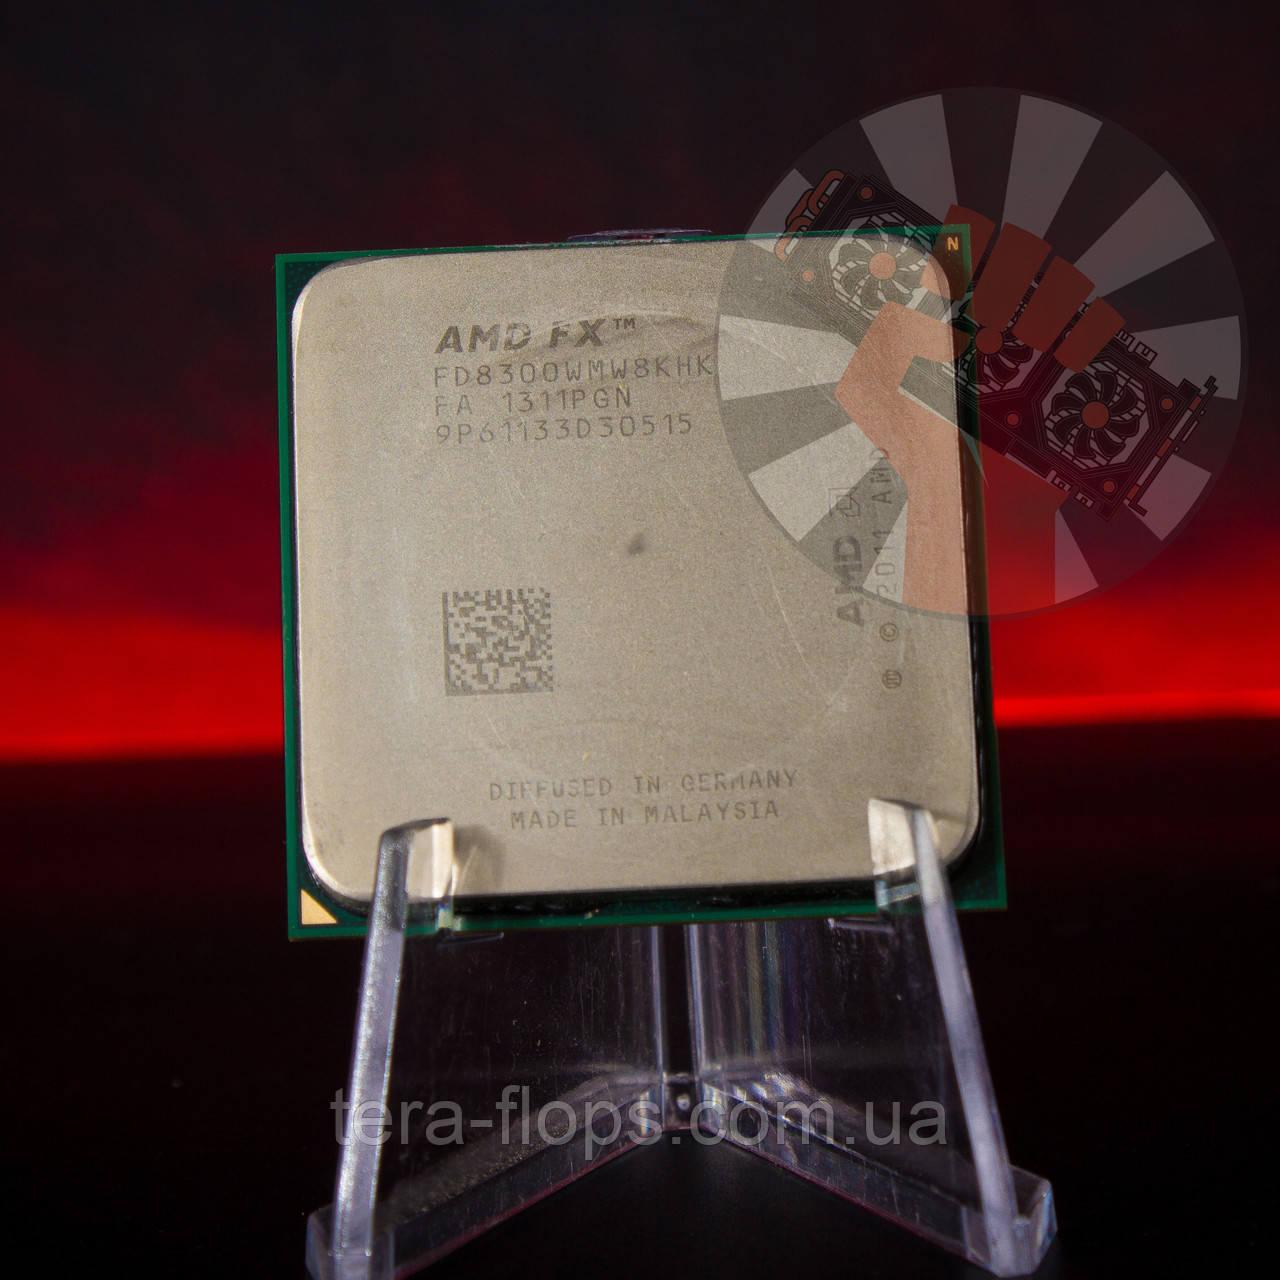 Процессор AMD FX-8300 Socket AM3+ (FD8300WMW8KHK) Б/У